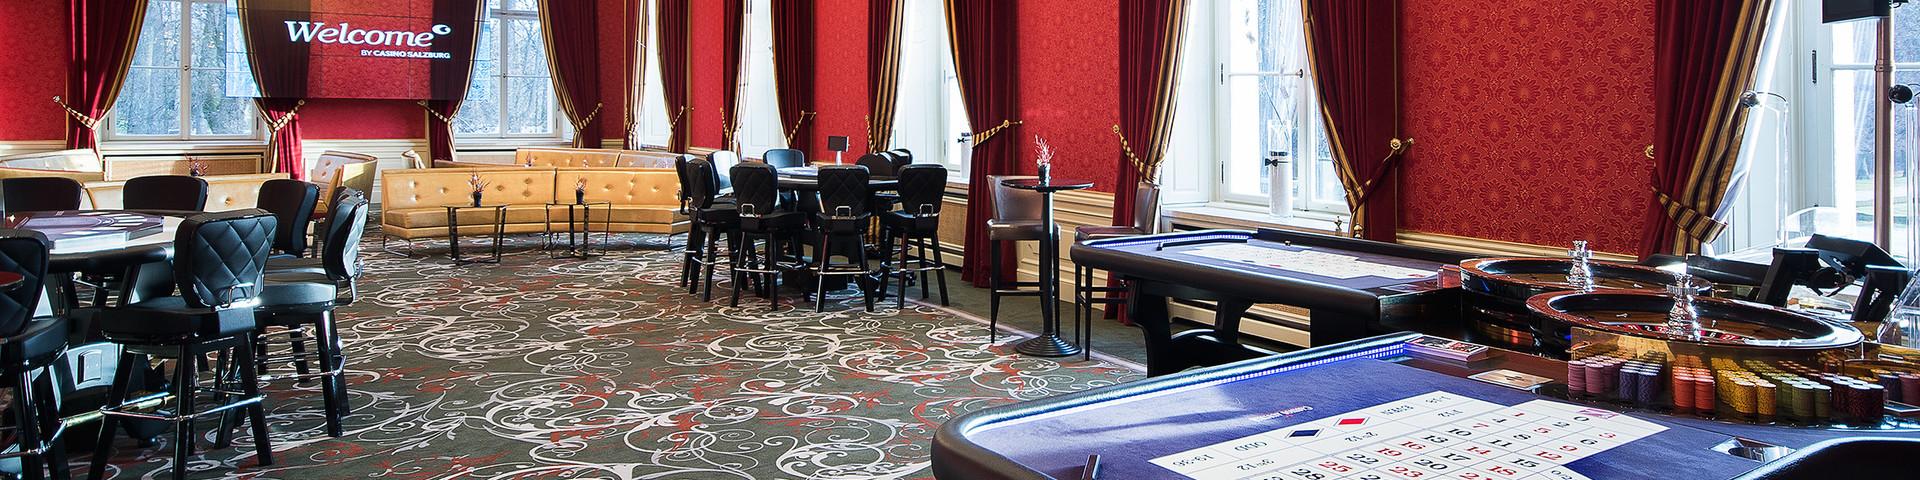 Casino Salzburg Lounge © Casino Salzburg